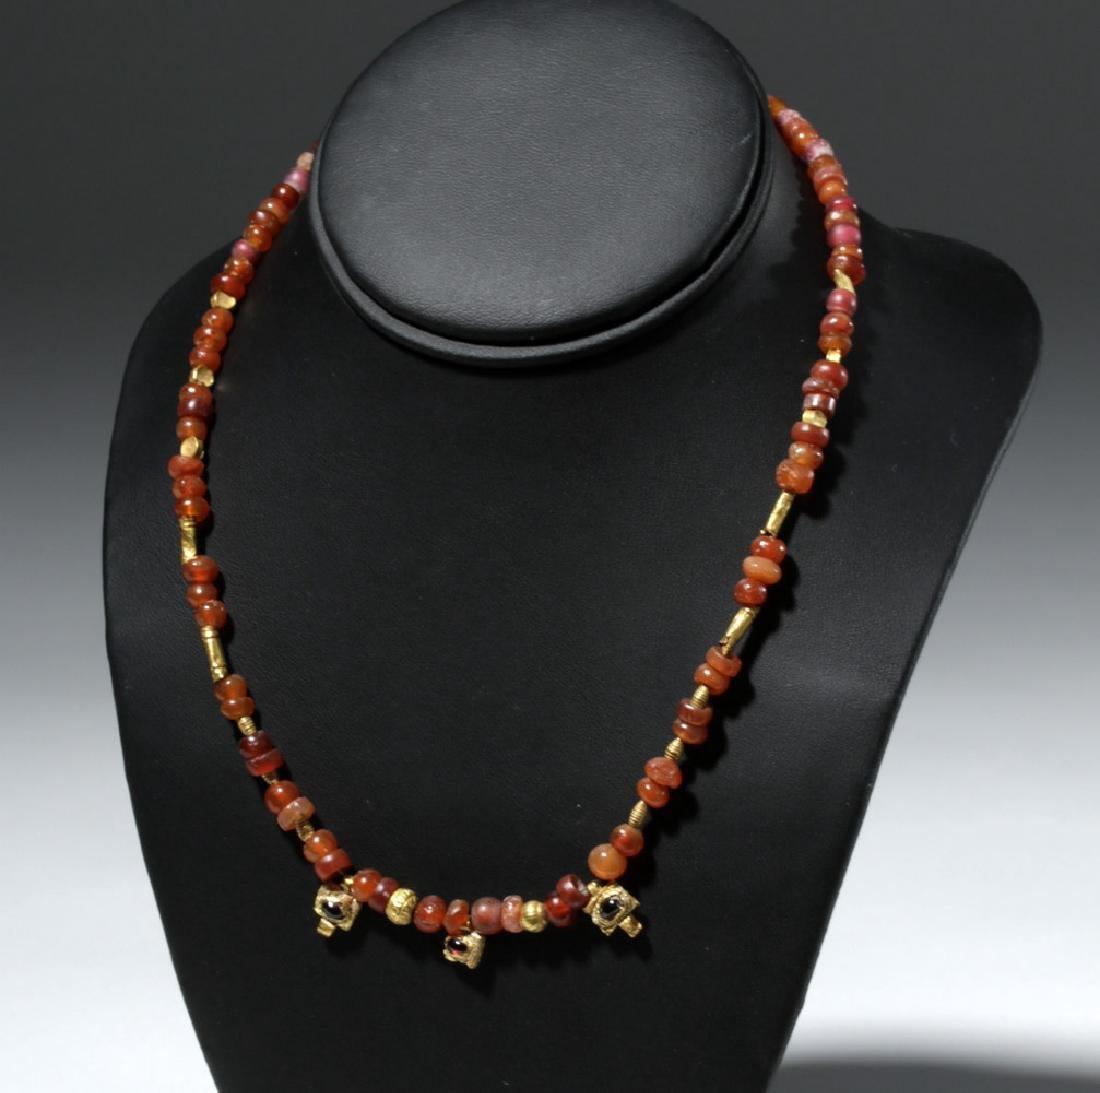 Roman Necklace w/ Carnelian, Garnet and Gold Beads